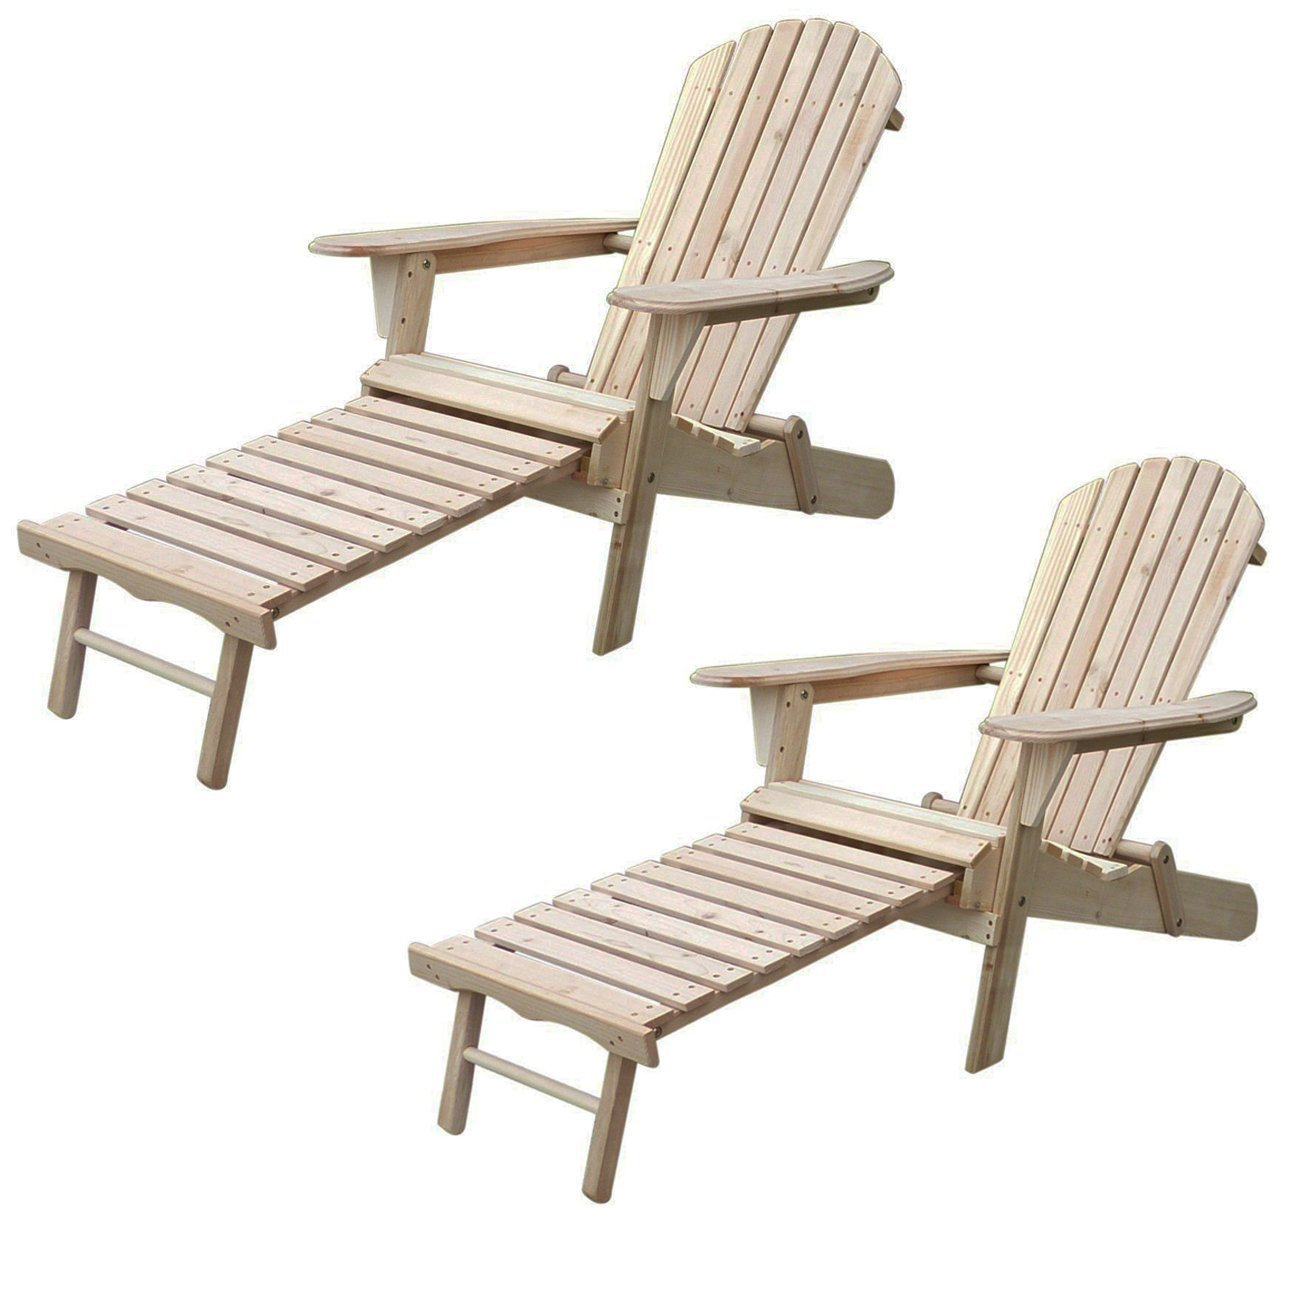 Sliverylake Outdoor Wood Adirondack Chair Chaise (2) by Sliverylake